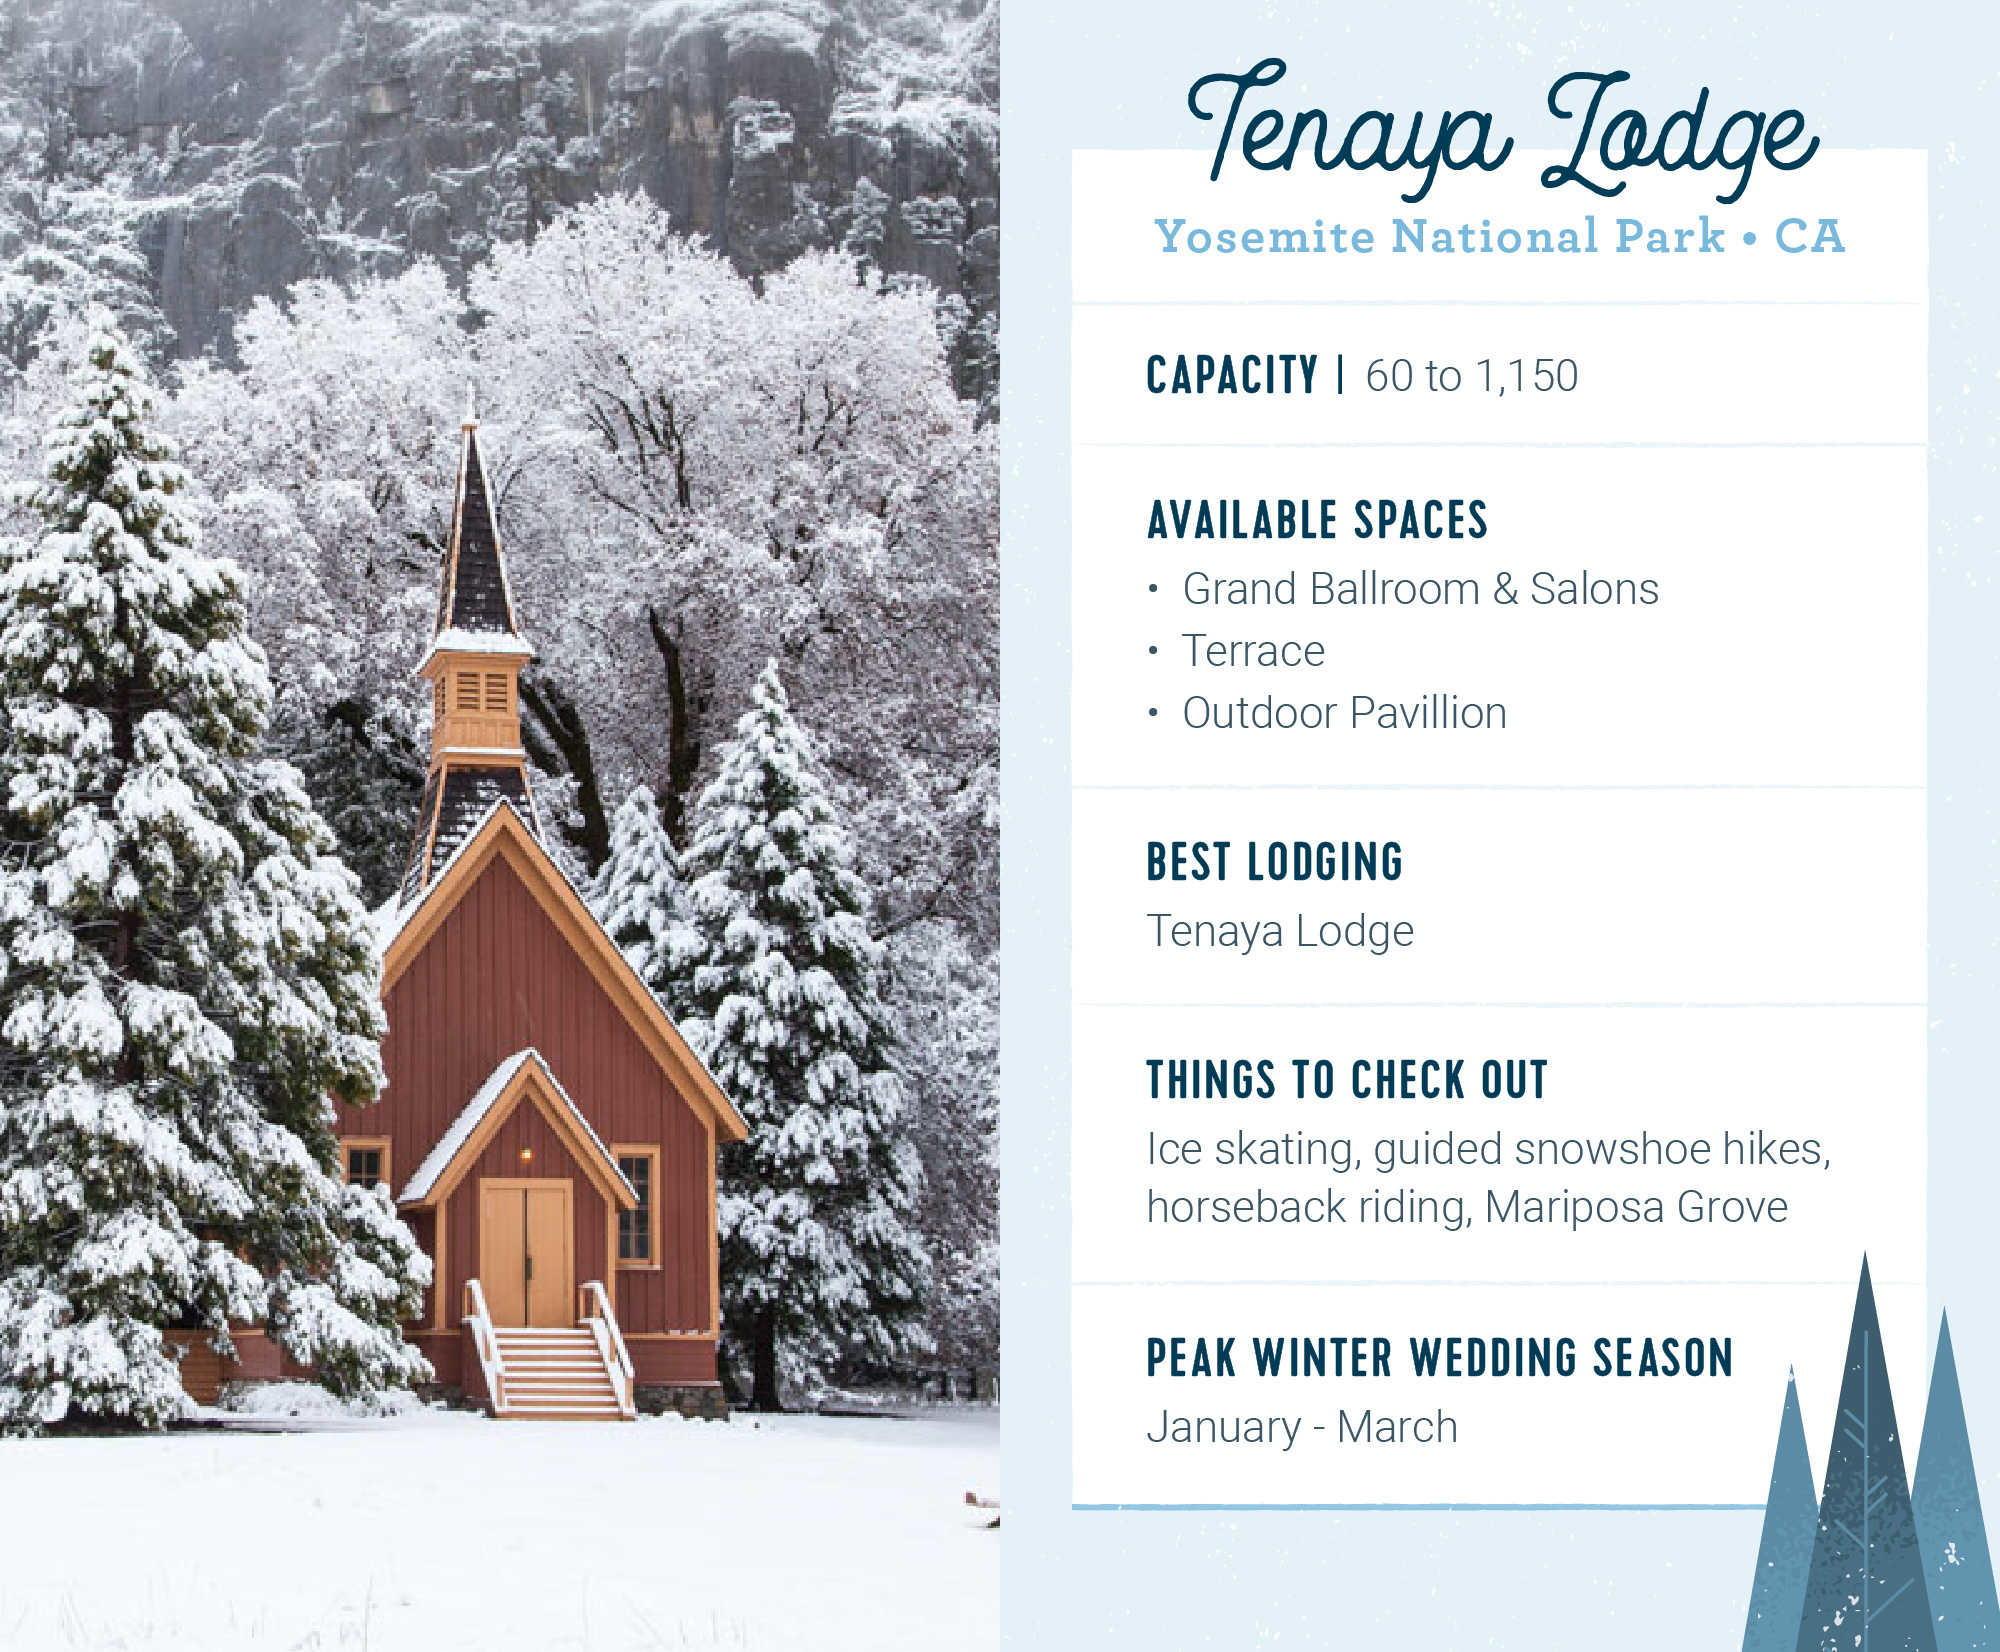 15 Enchanting Winter Wedding Venues | AllFreeDIYWeddings.com